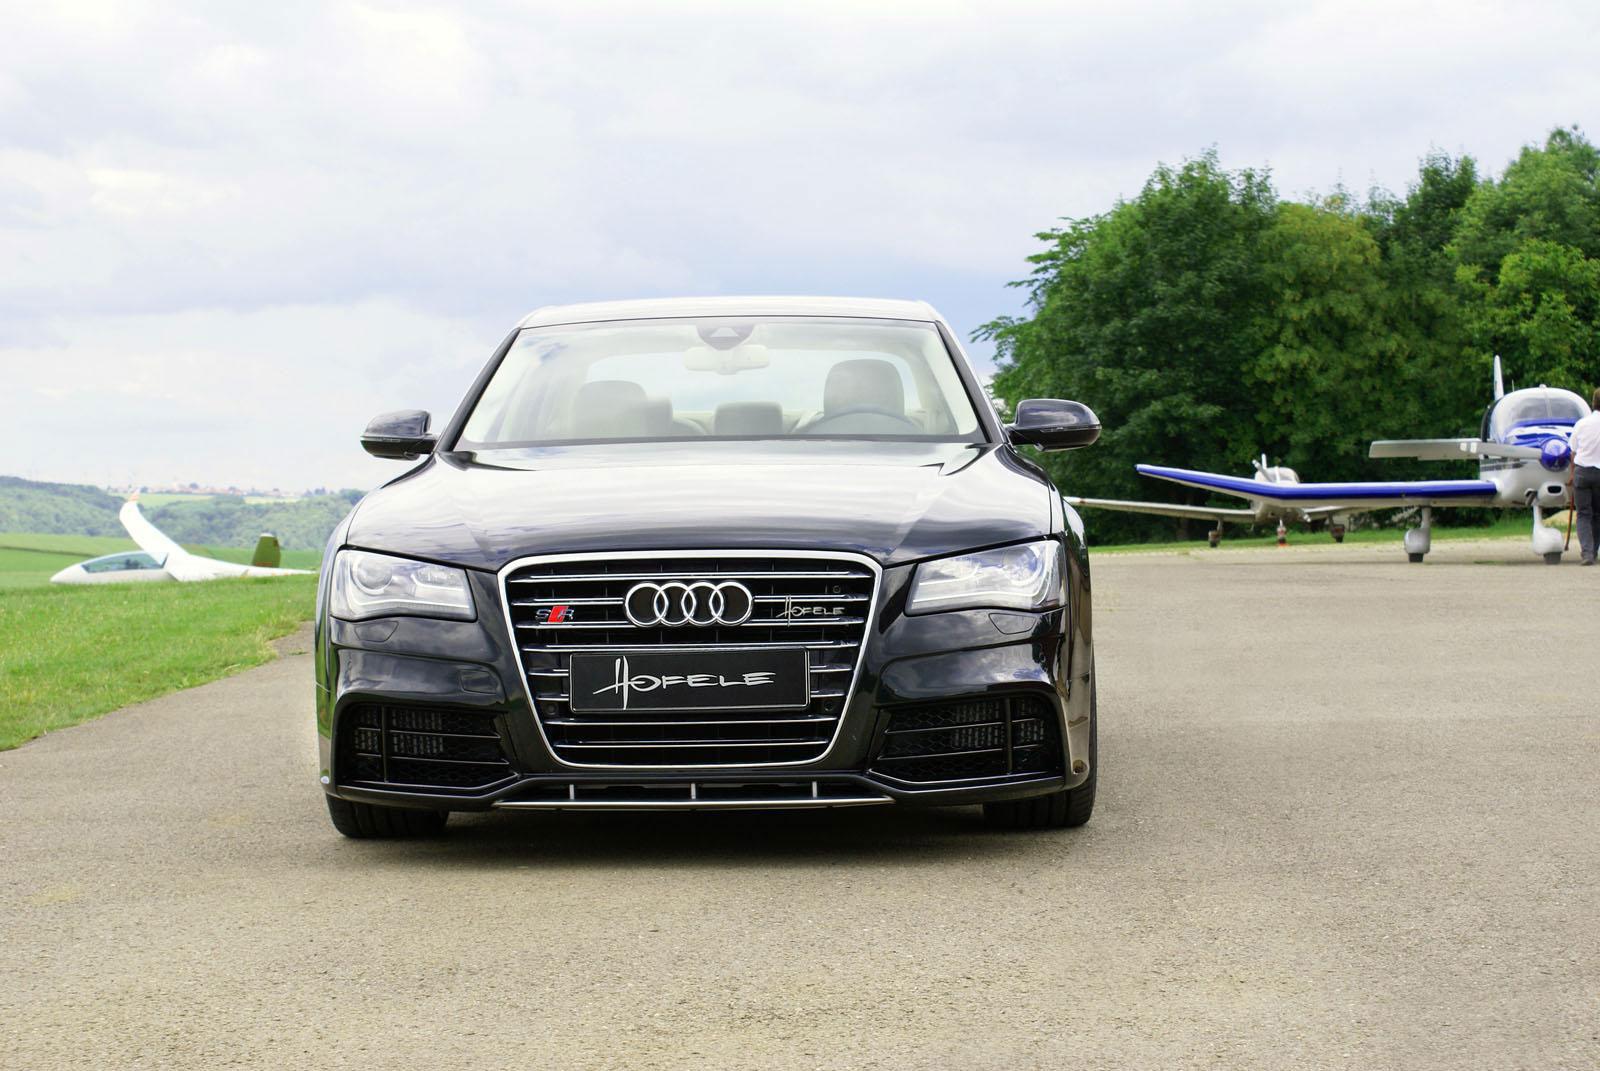 Hofele Design elegantně upravil Audi A8 5